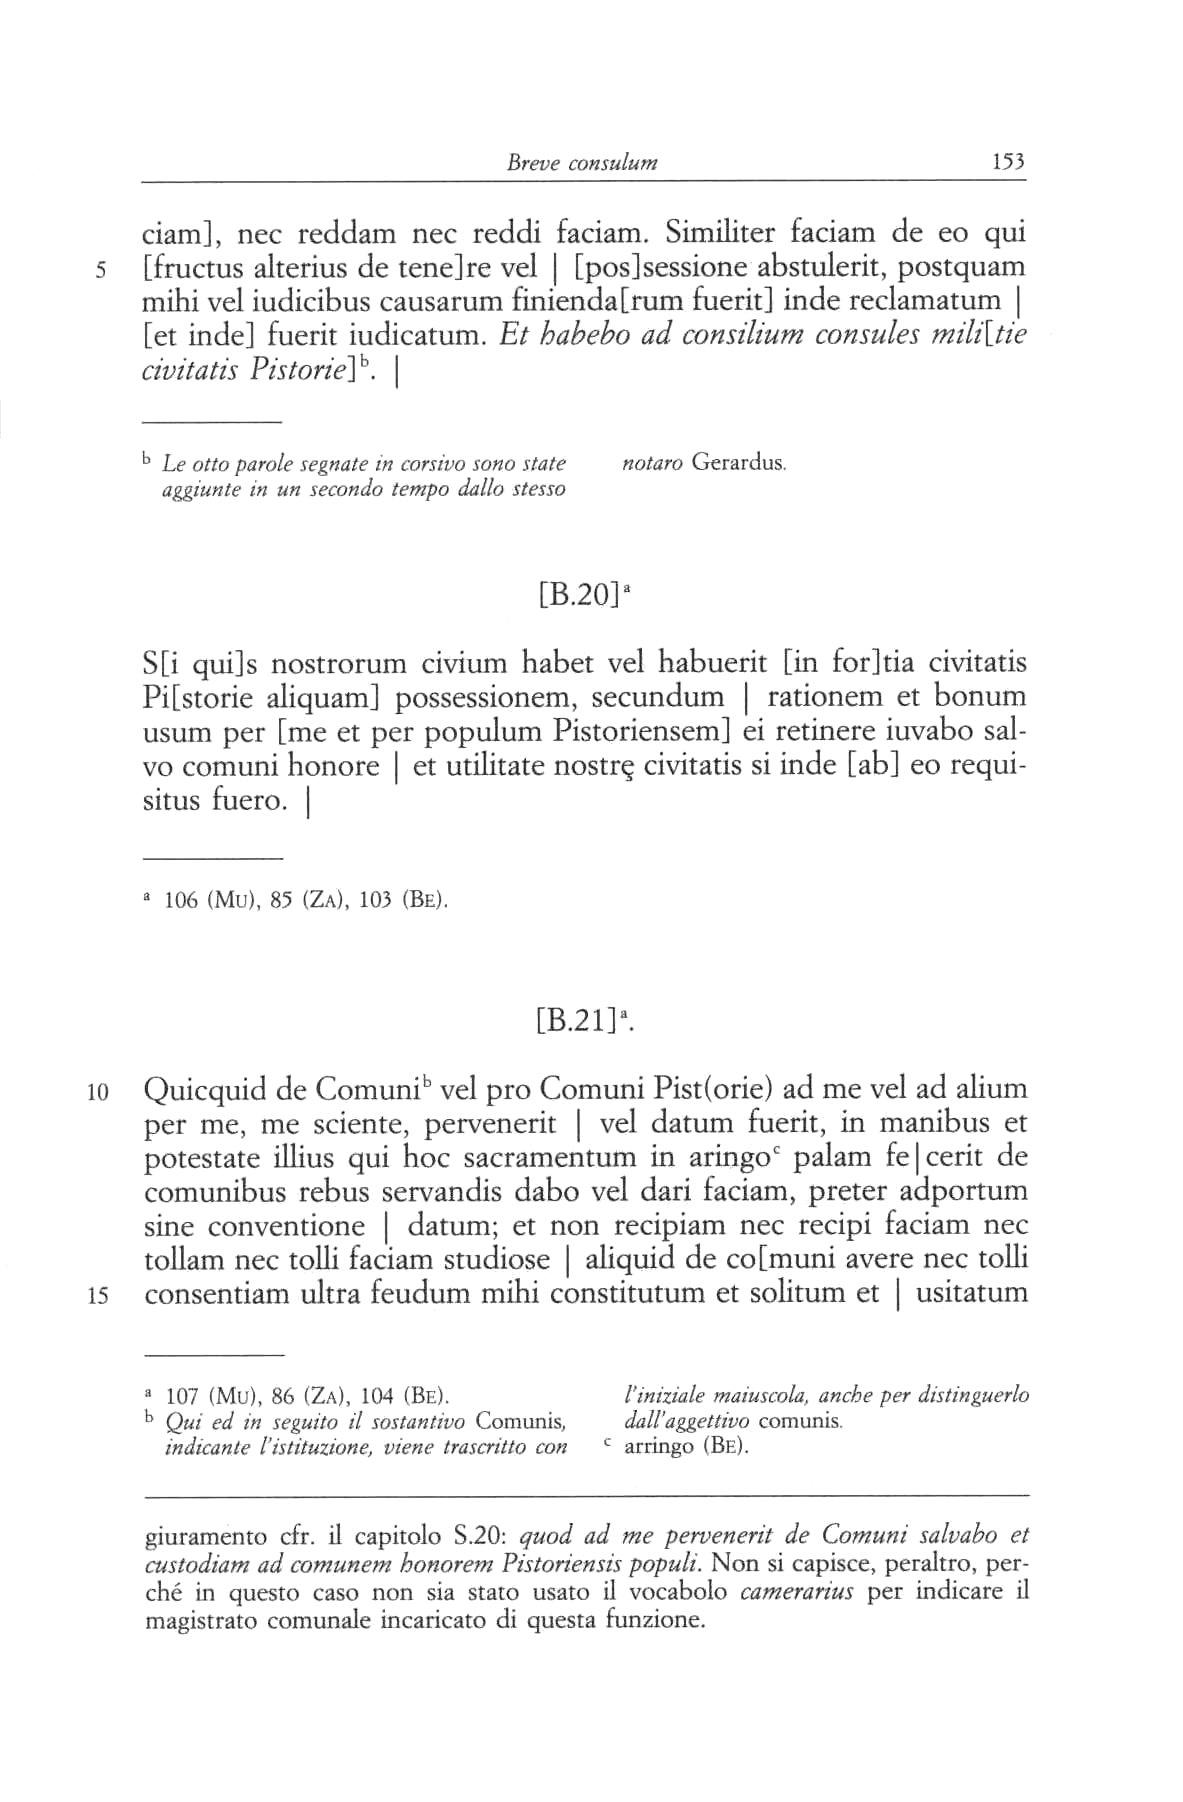 statuti pistoiesi del sec.XII 0153.jpg